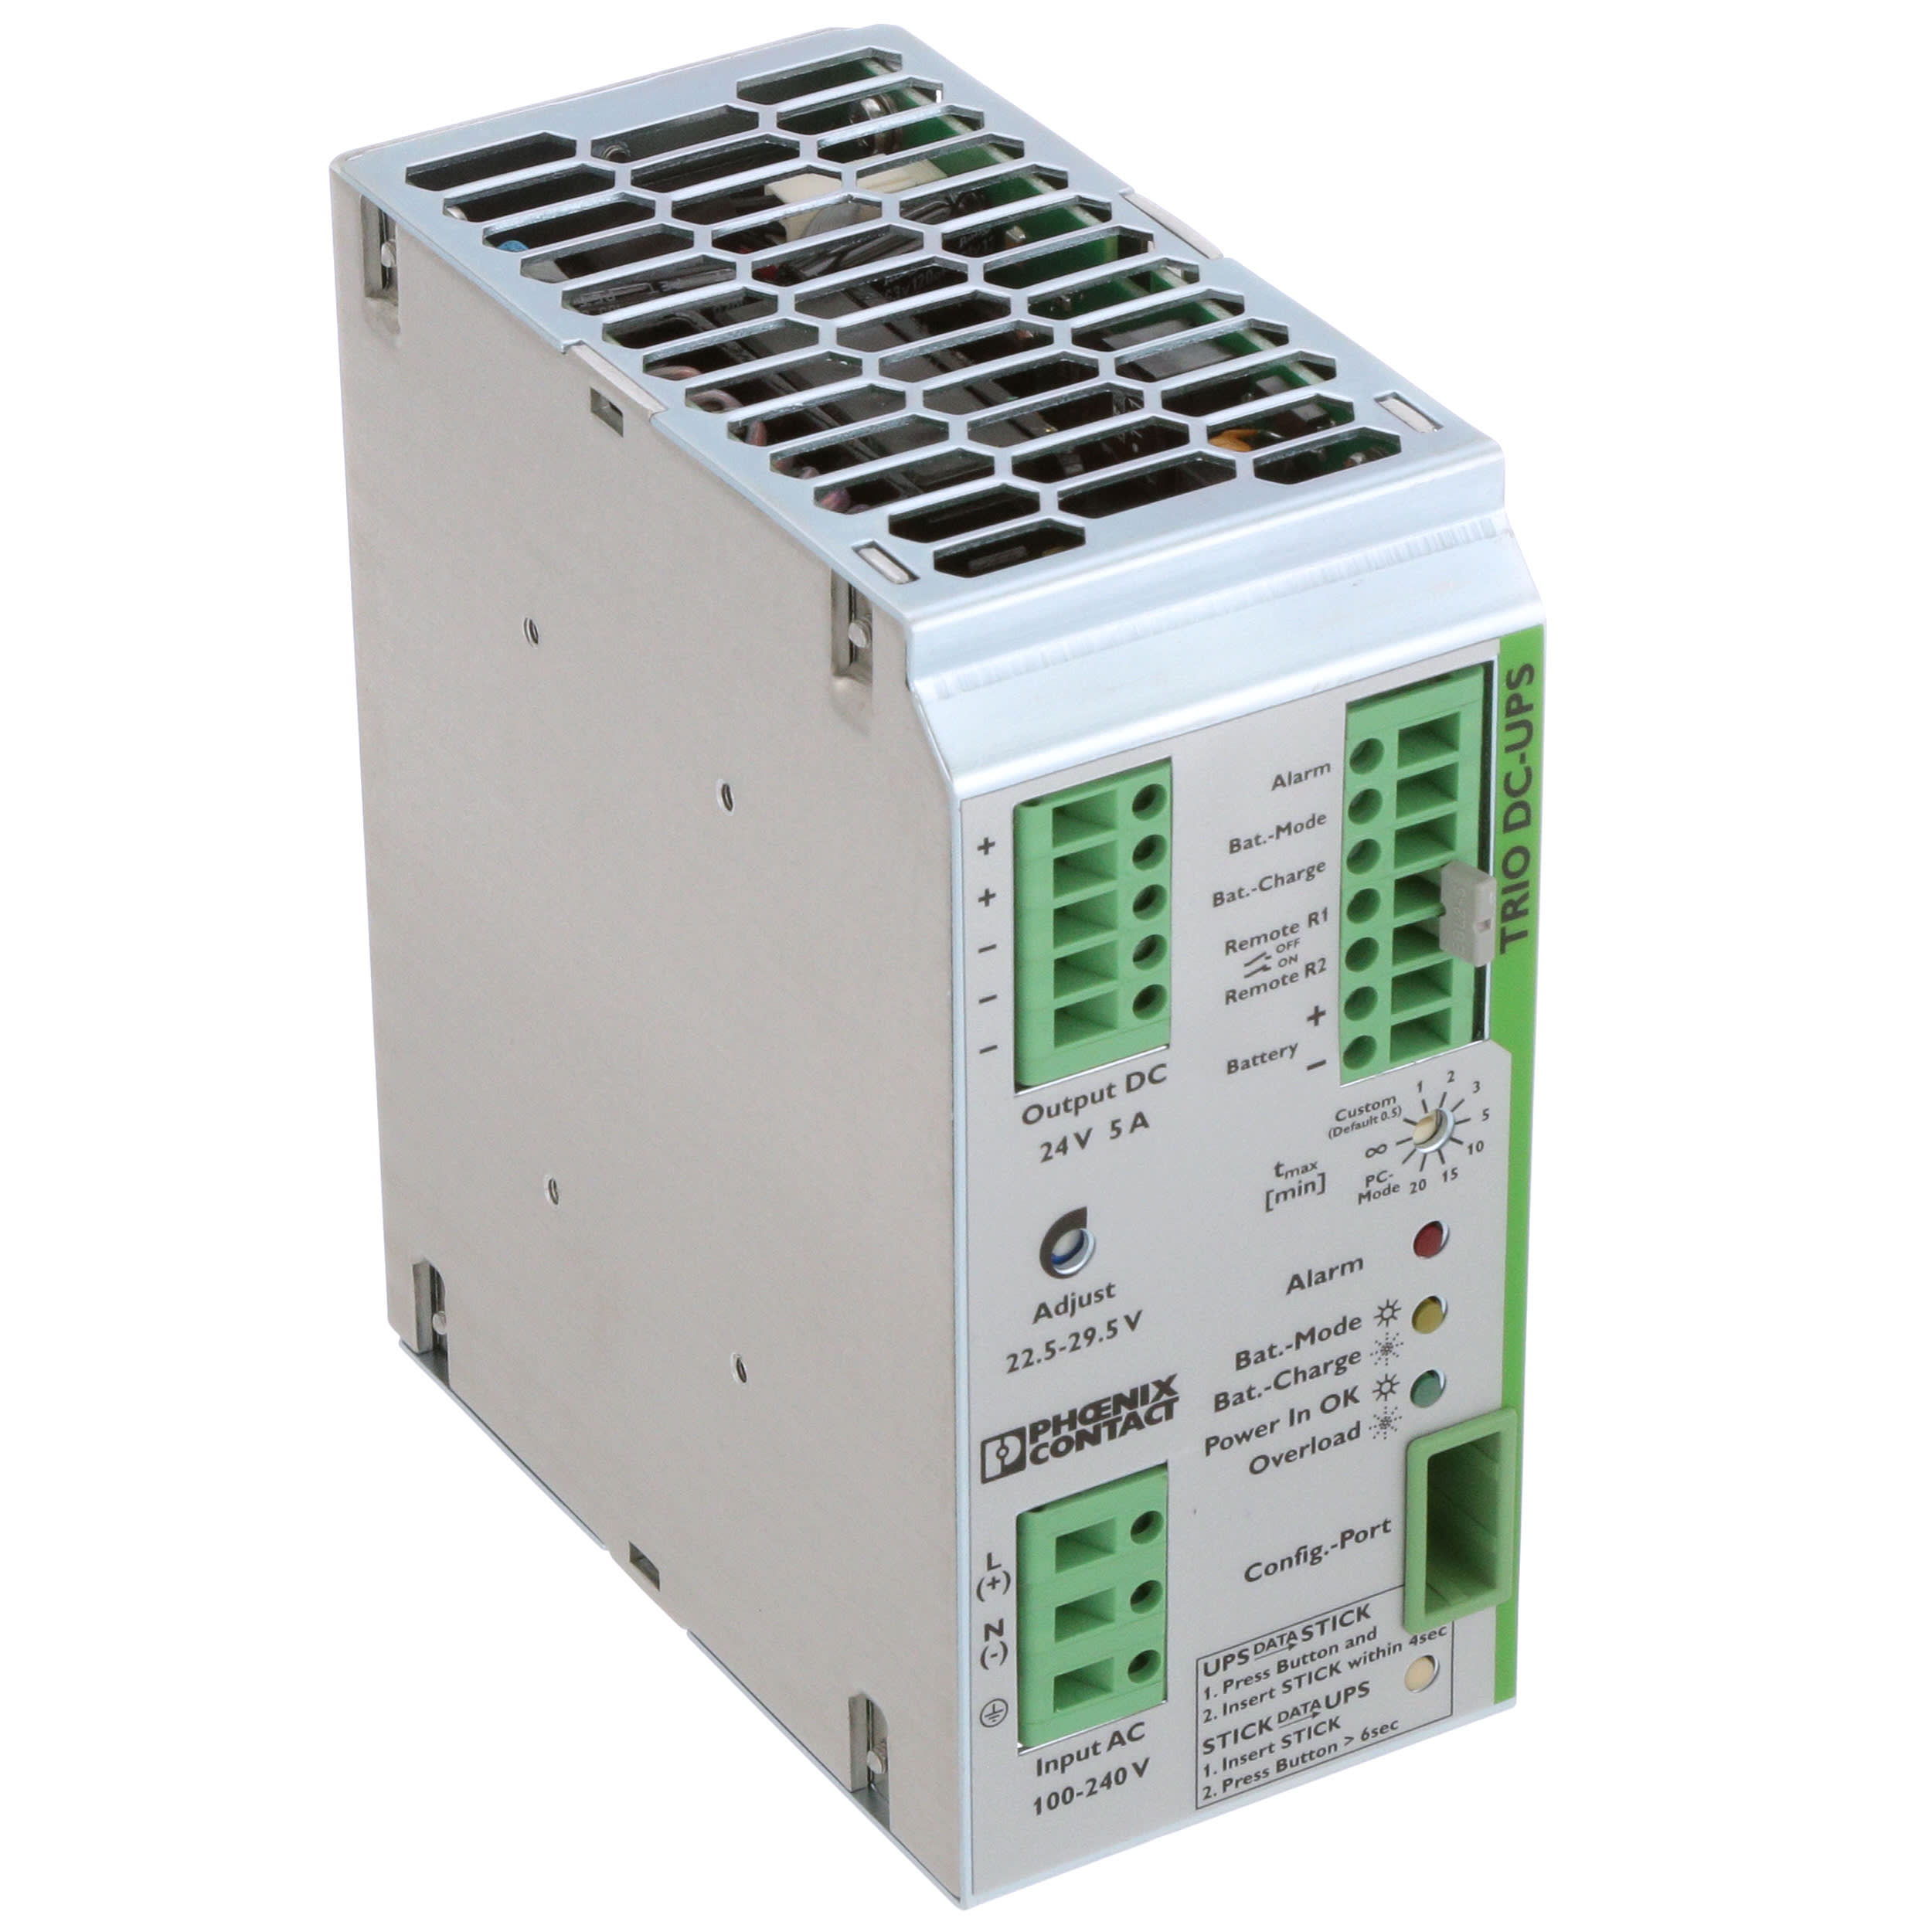 New Phoenix Contact 2866611 TRIO-UPS//1AC//24DC//5 Uninterruptible Power Supply